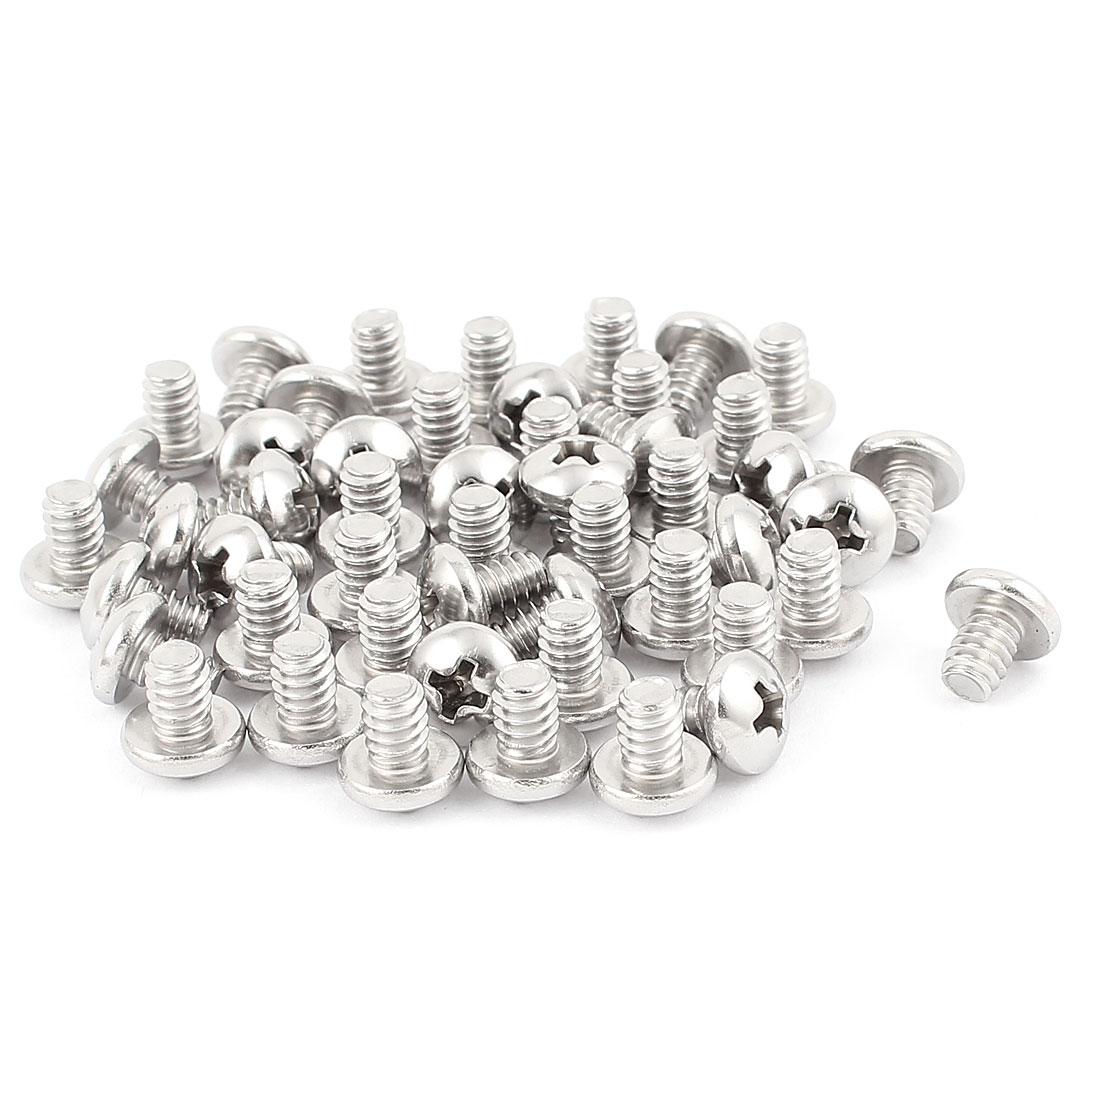 "50pcs Stainless Steel Phillips Truss Head Machine Screws Fasteners #10-24 x 1/4"""